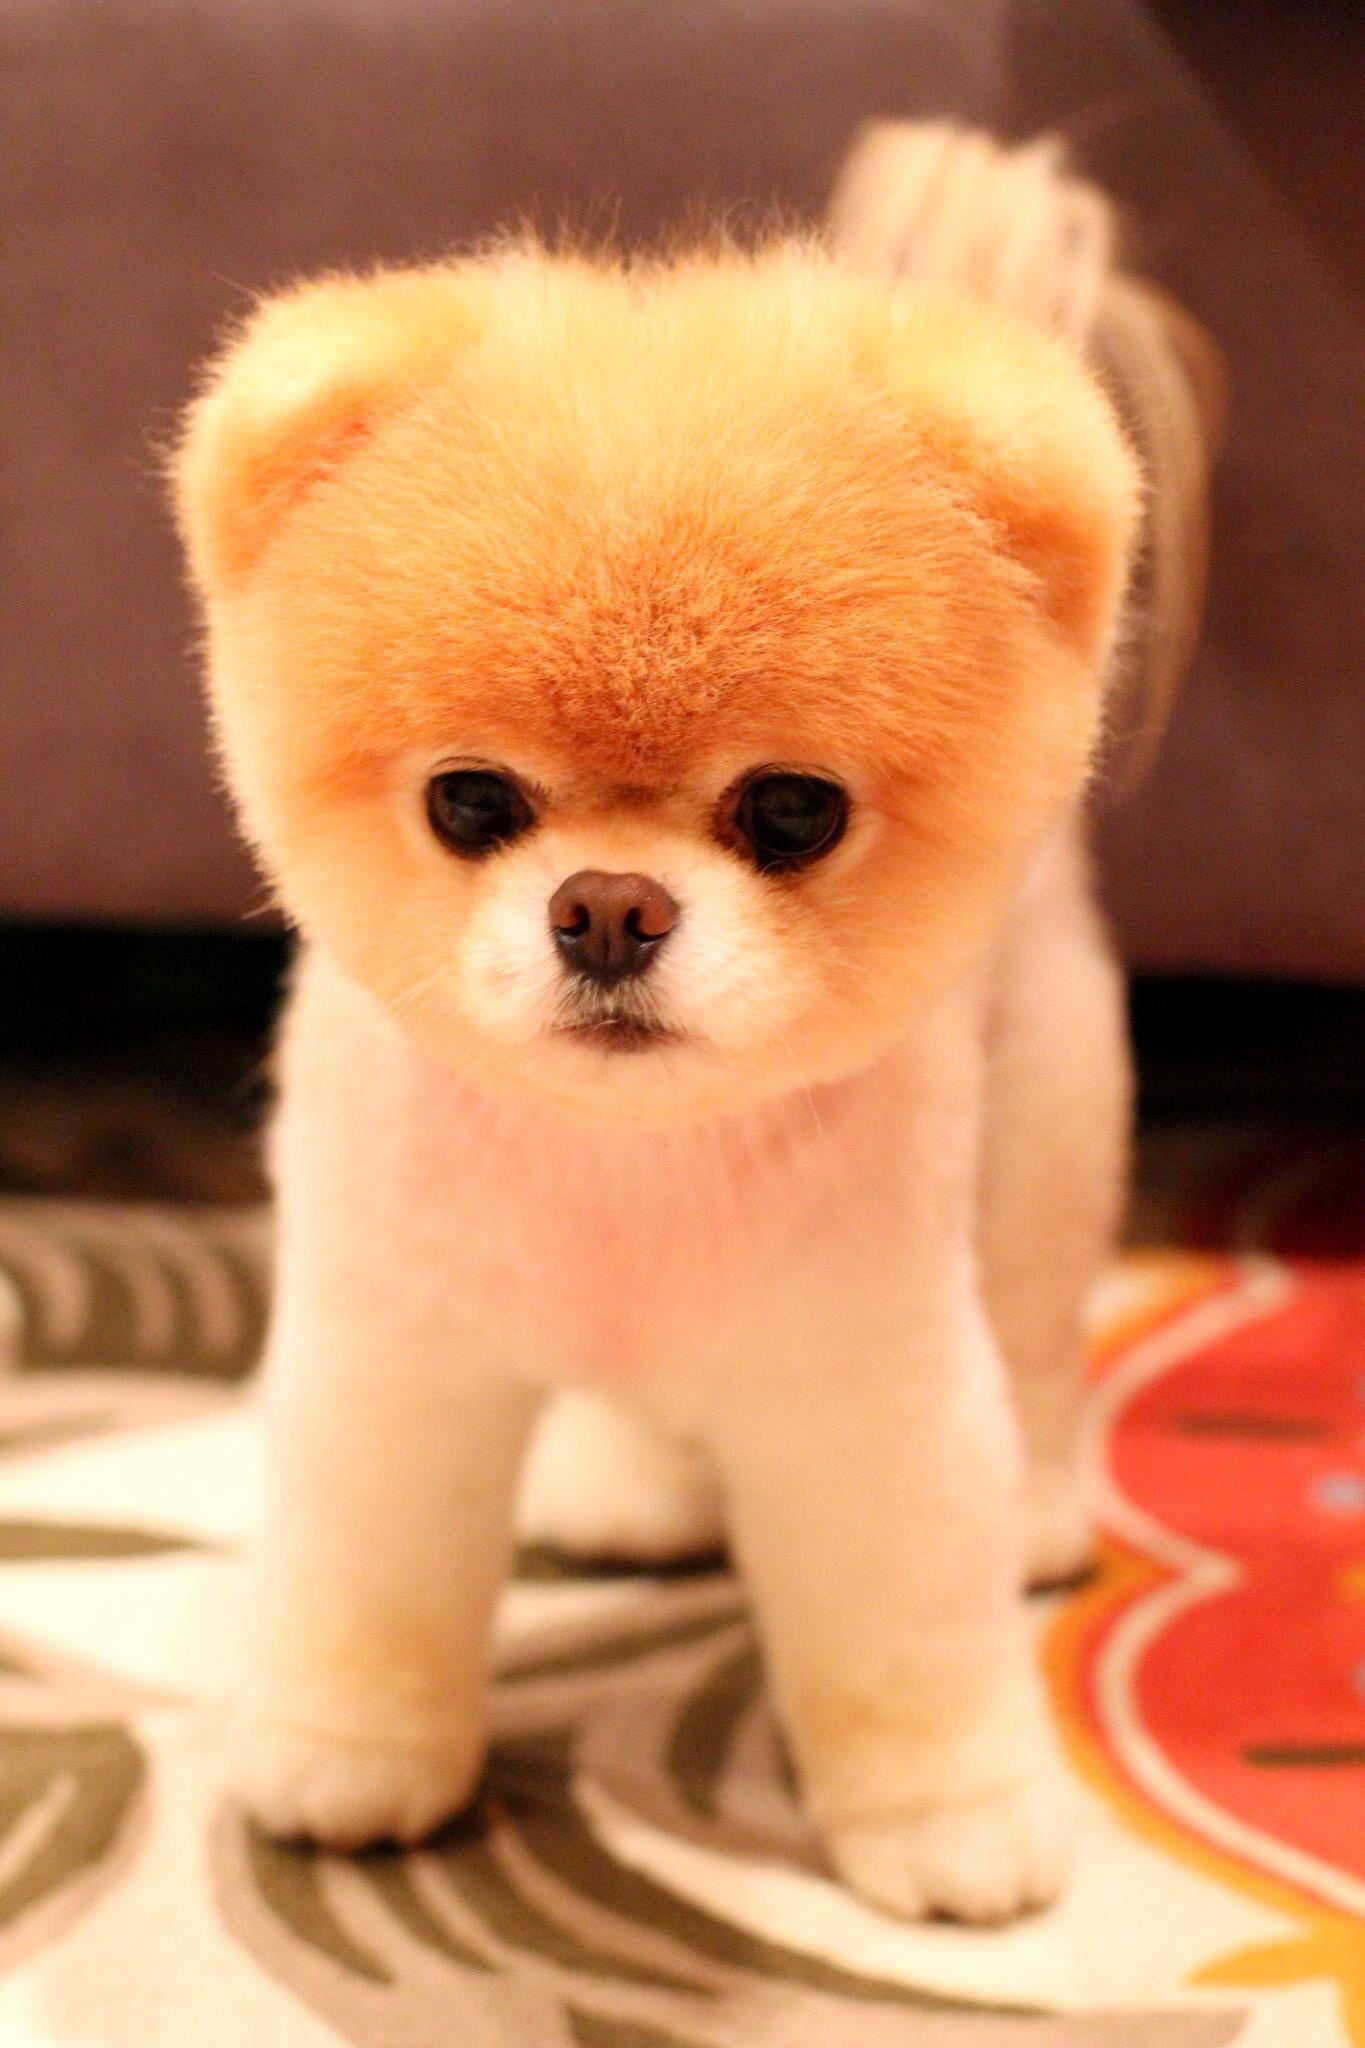 Great Cdog Chubby Adorable Dog - 859739fa2f6ad135576c5e6d07331e51  Photograph_69992  .jpg